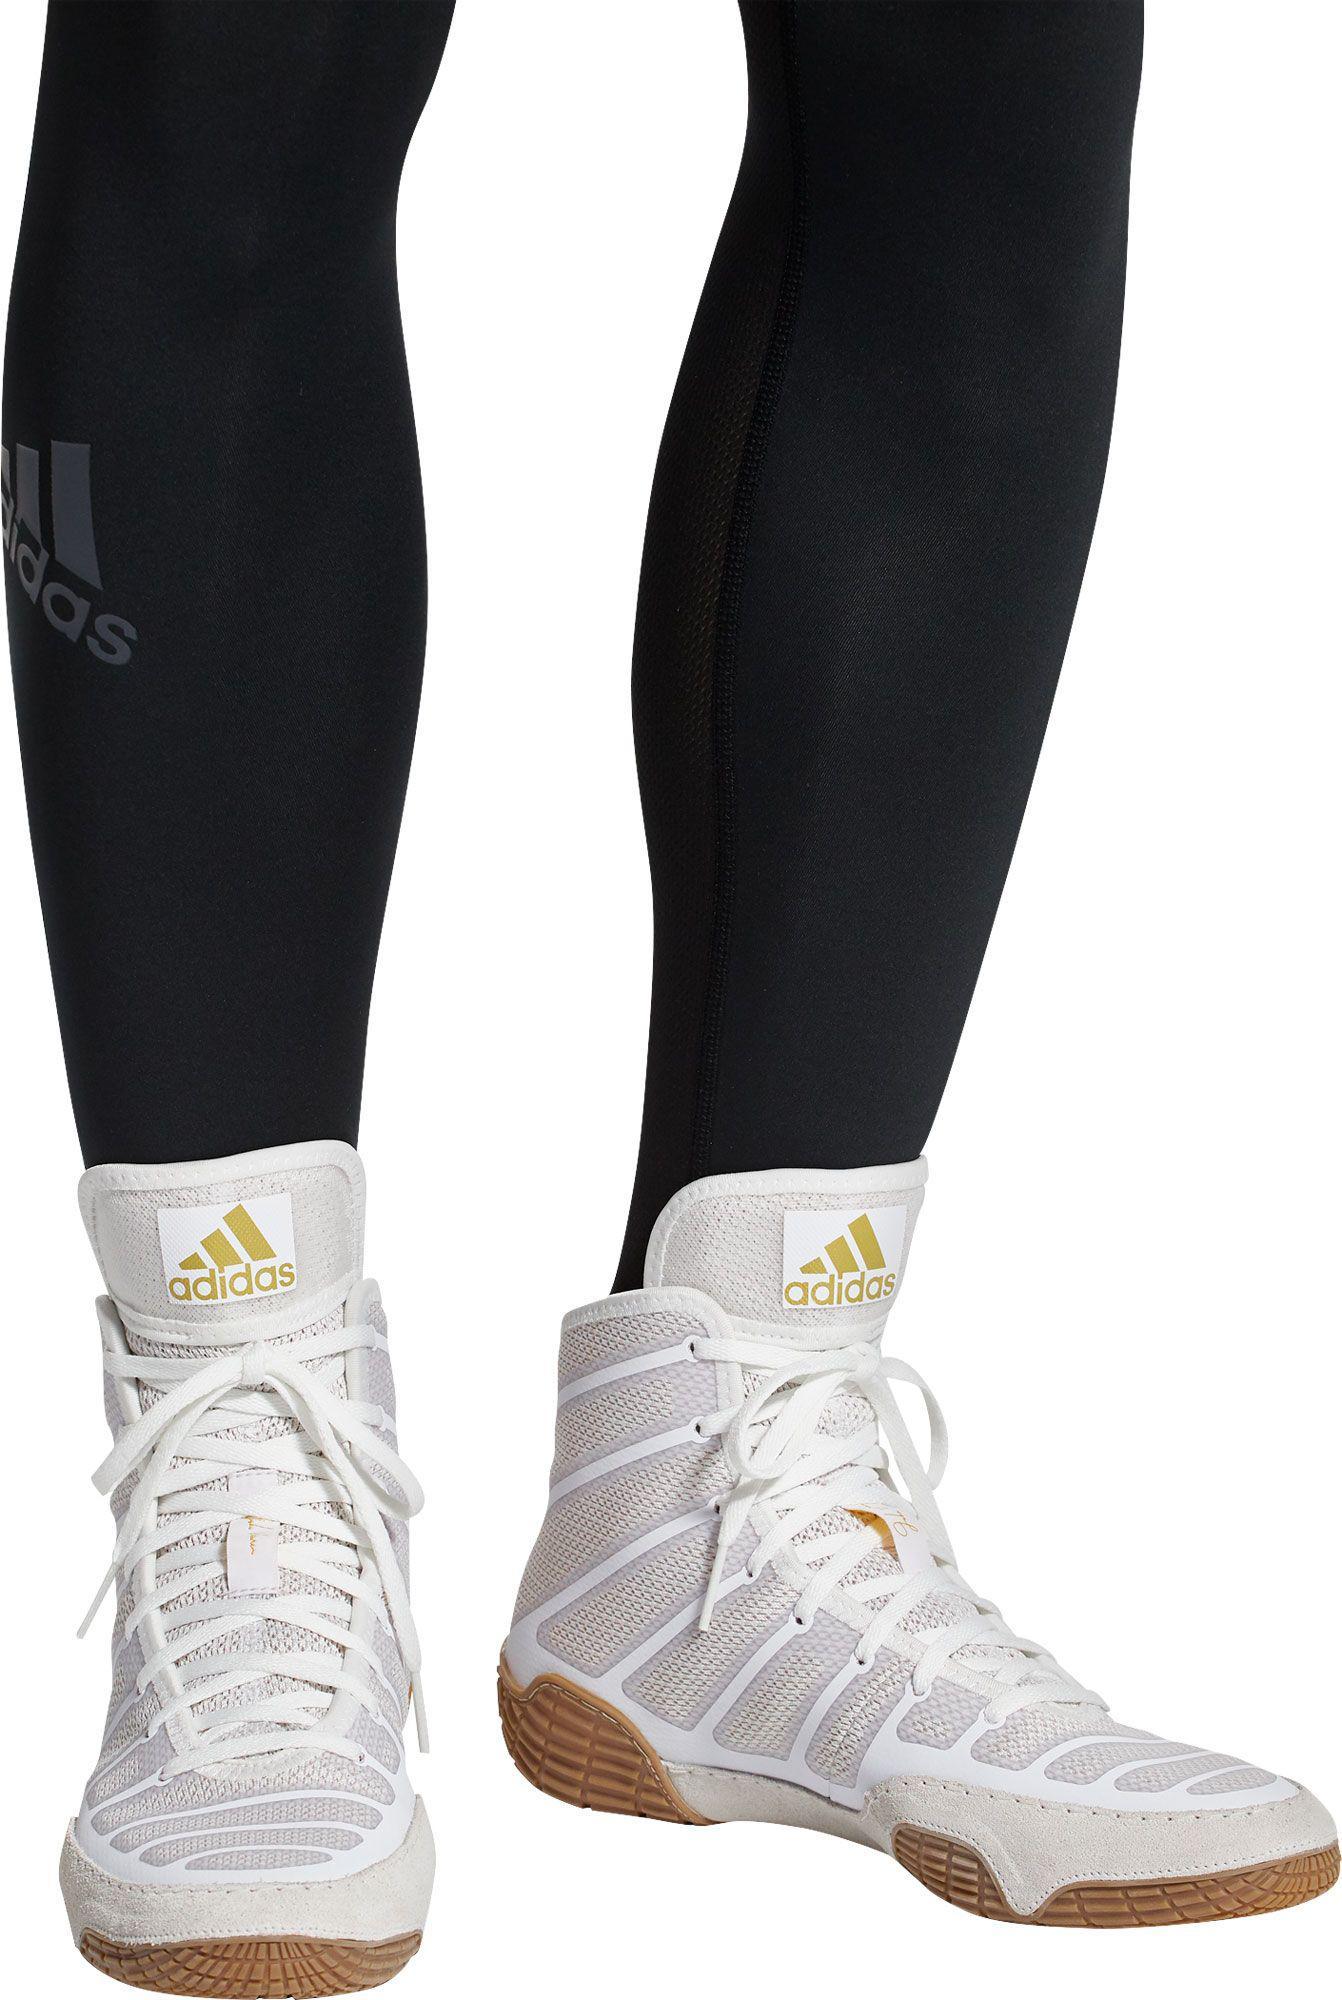 adidas adizero varner 2 white and gold